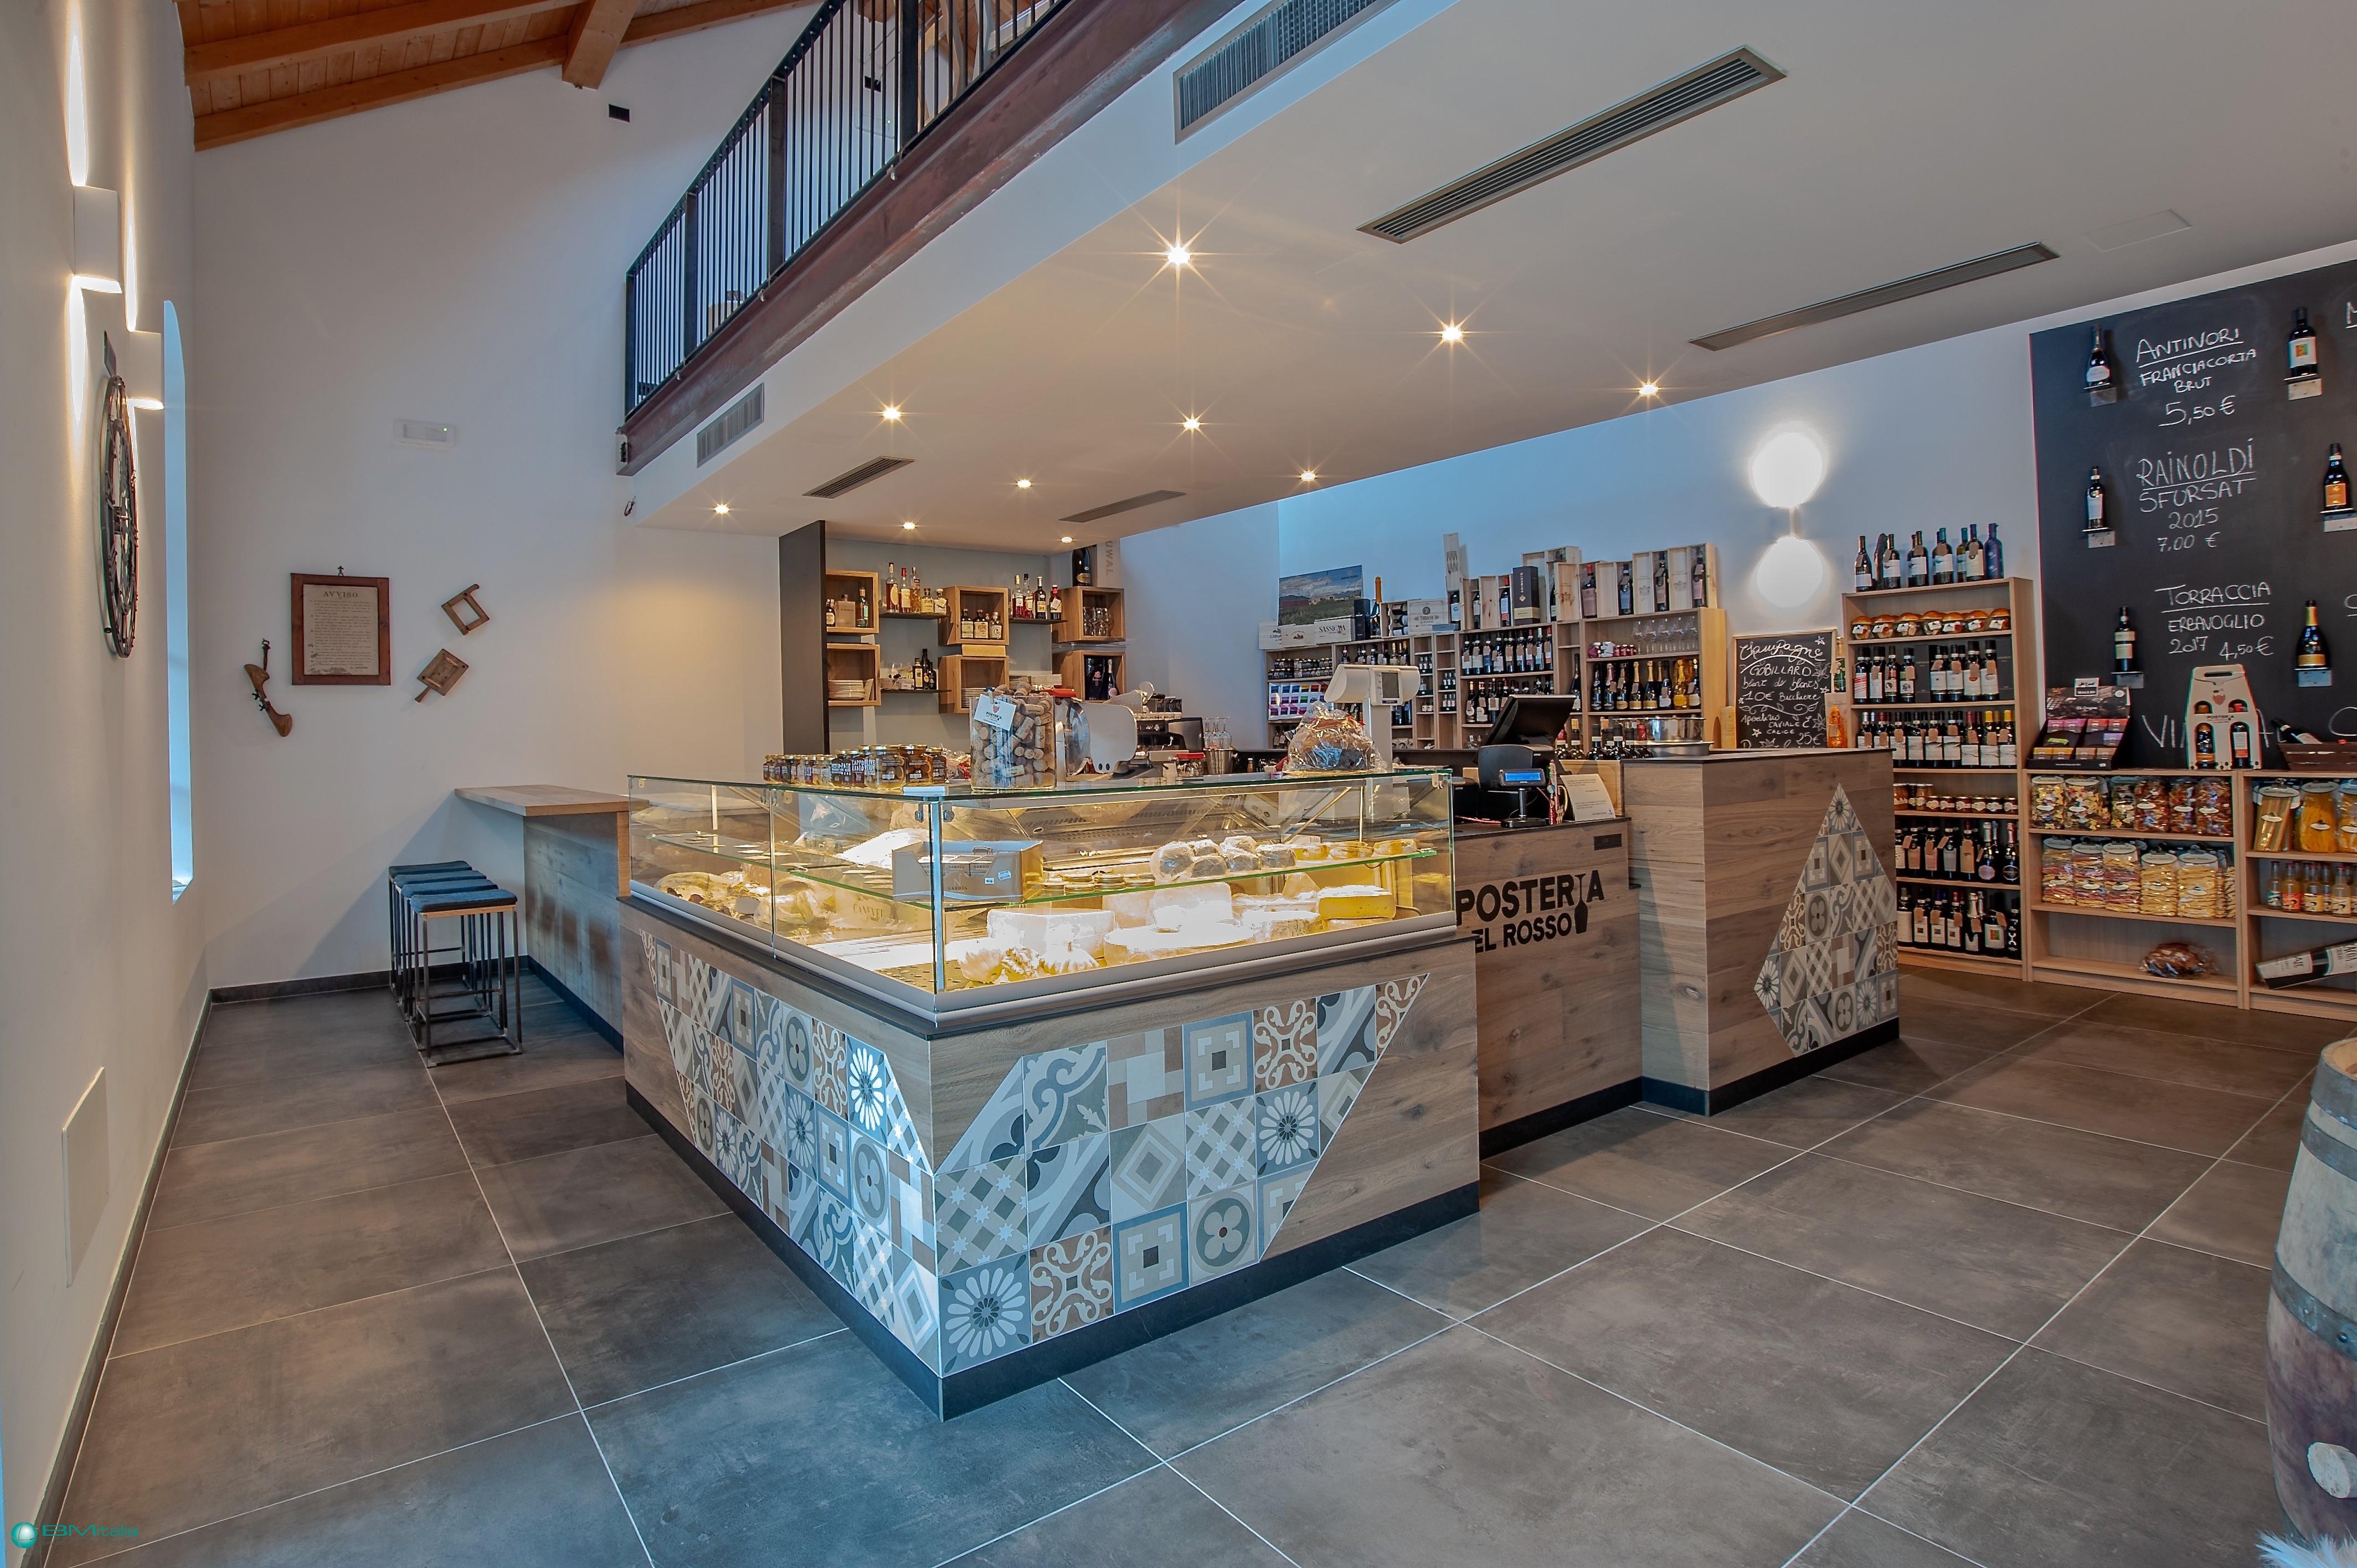 Arredo per negozi bar salumeria winebar enoteca for Idee per arredare enoteca